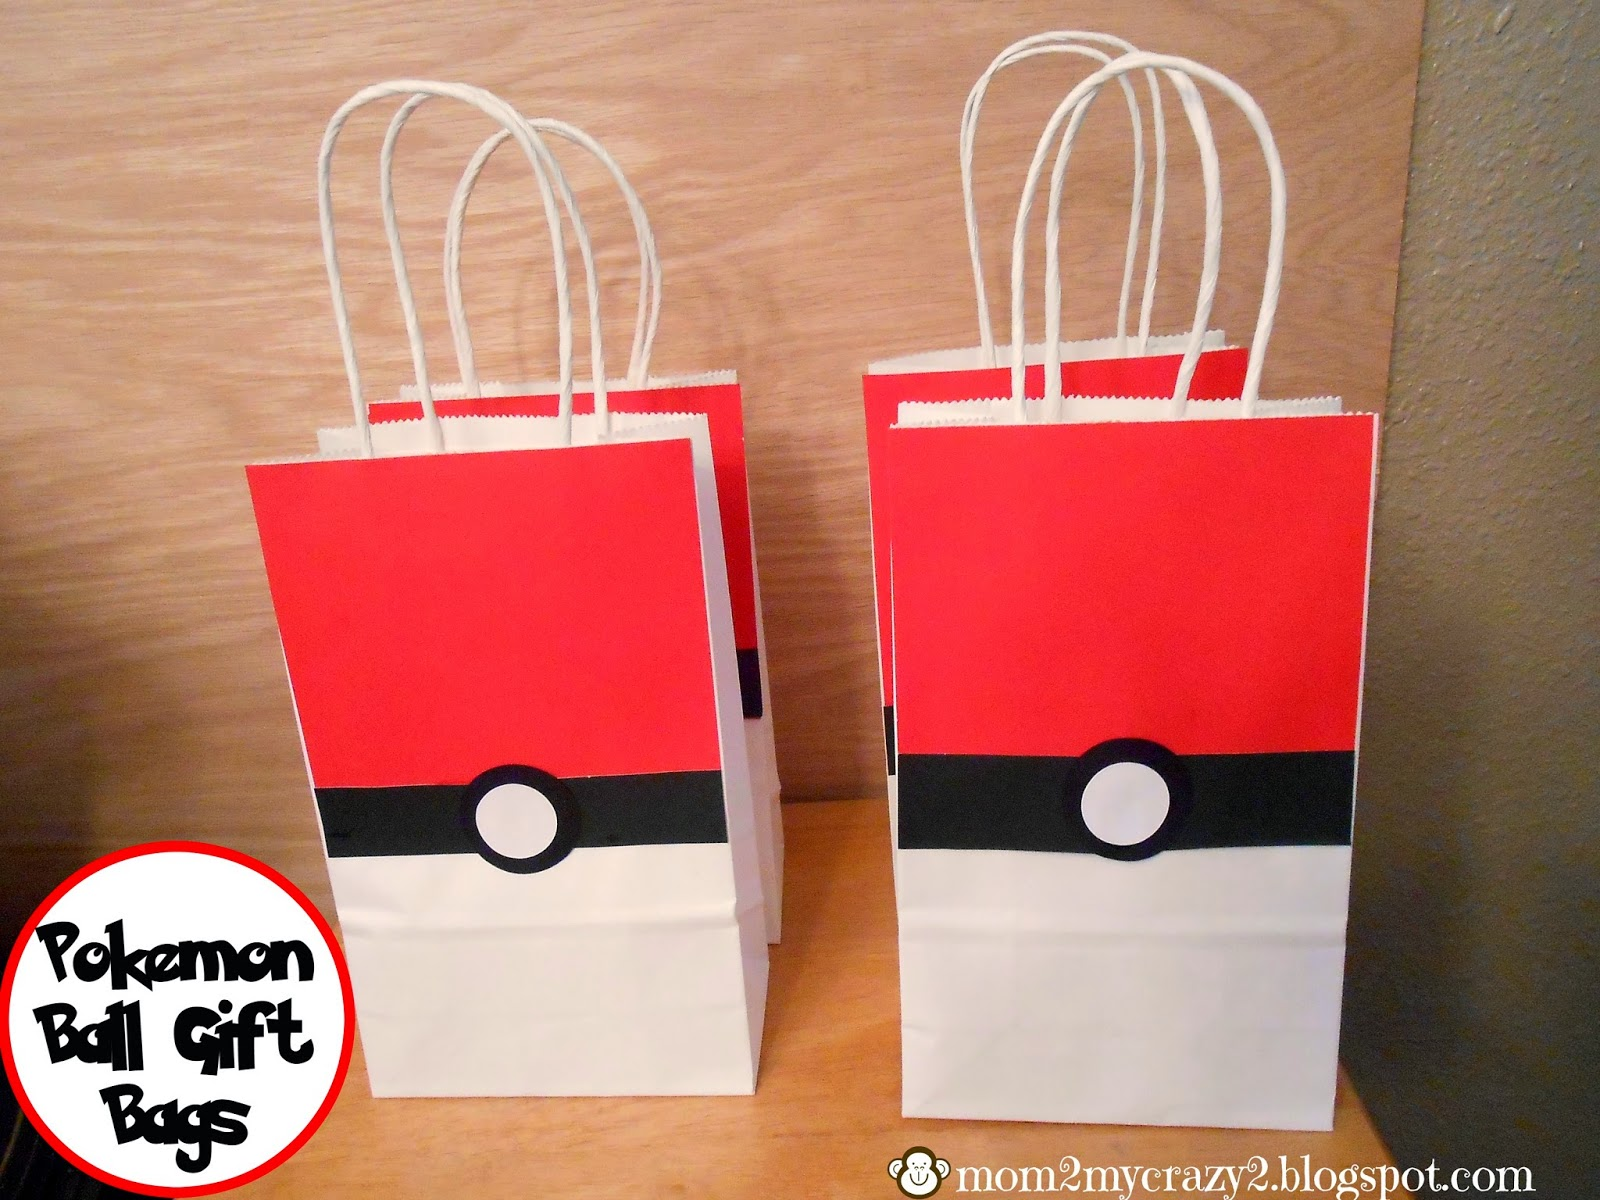 Pokemon Ball Gift Bags